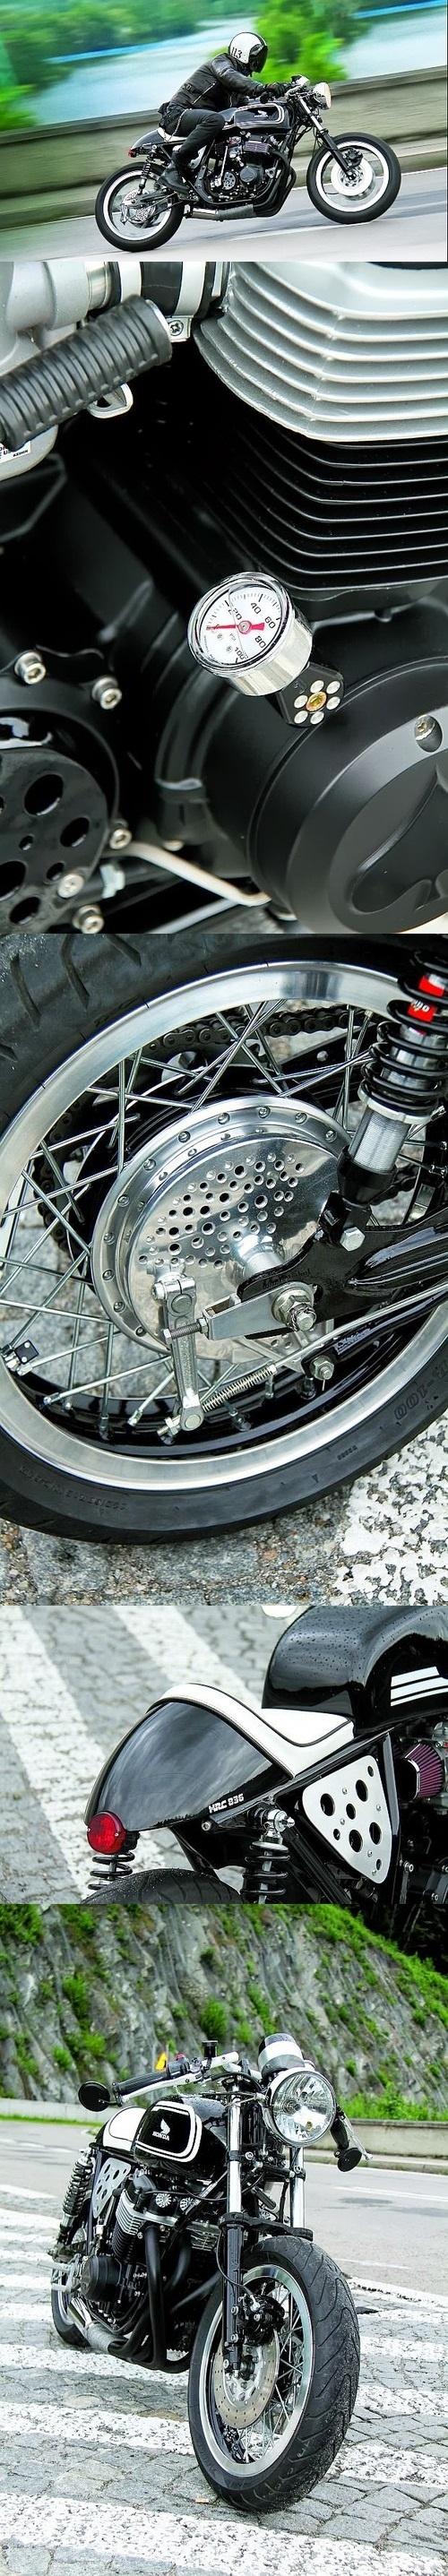 Honda CB750 Cafe Racer from Poland #caferacer #motorcycles #motos   caferacerpasion.com